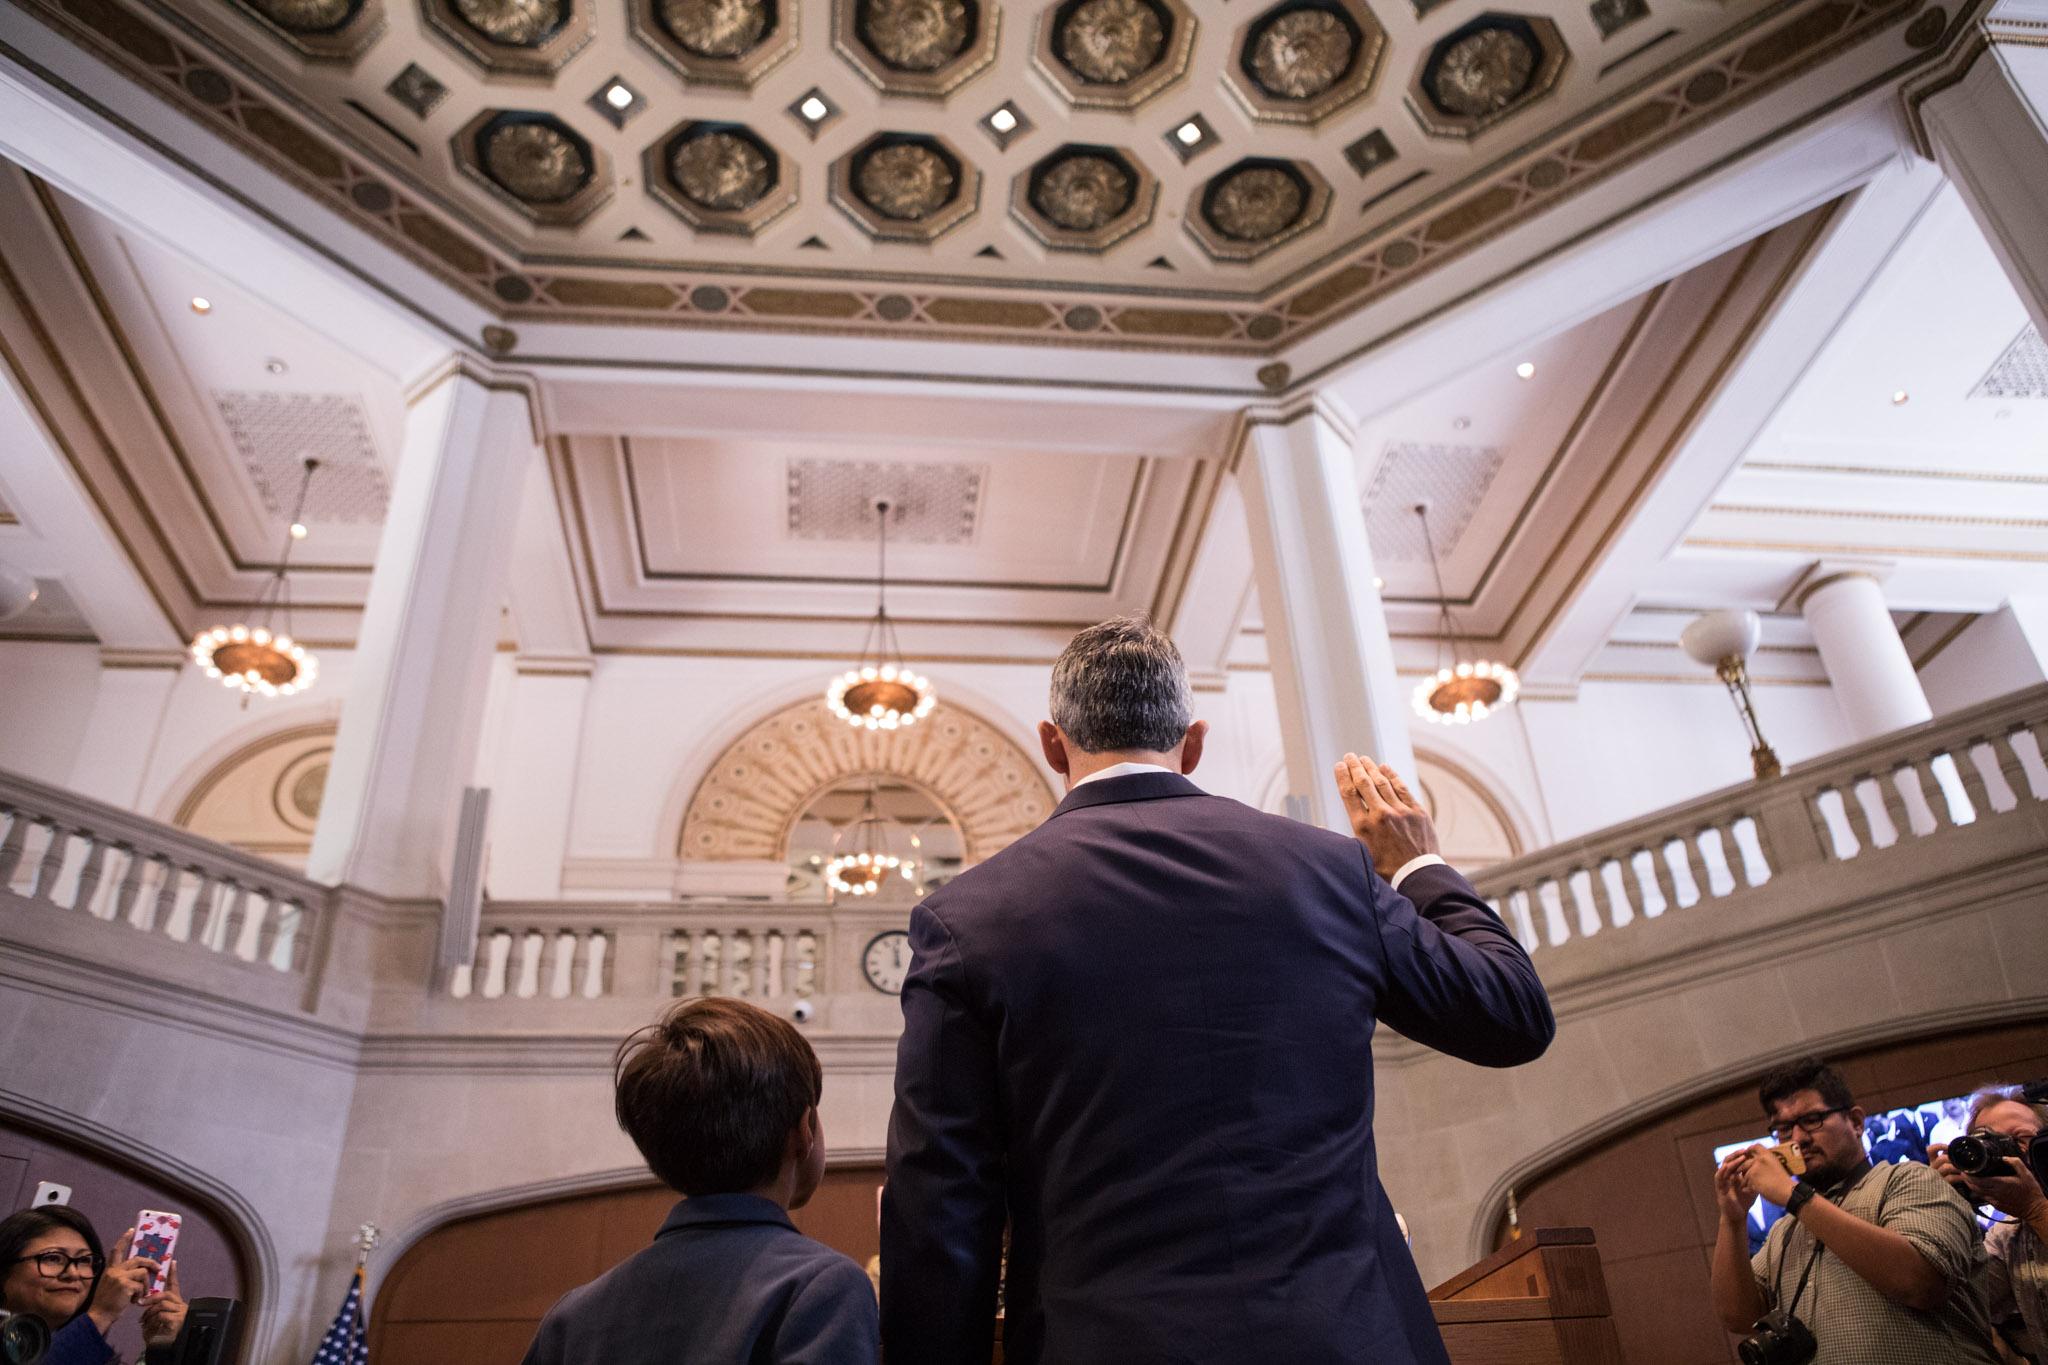 Ron Nirenberg is sworn in as mayor of San Antonio alongside his son Jonah, 8, on June 21, 2017.